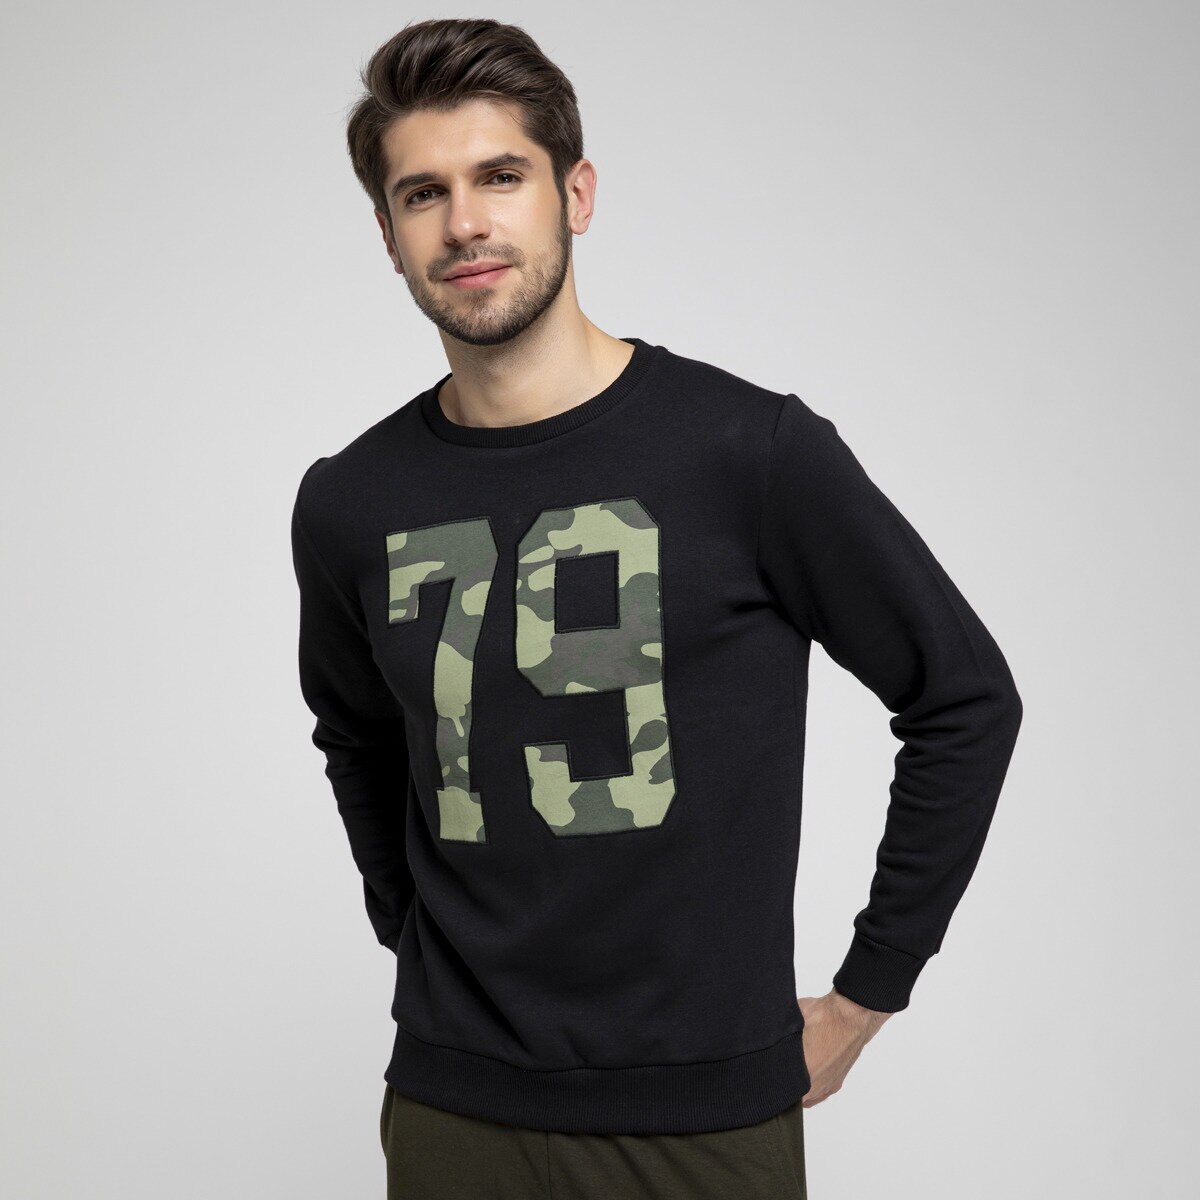 FLO THOR 2 SWEAT Black Men S Sweatshirt LUMBERJACK